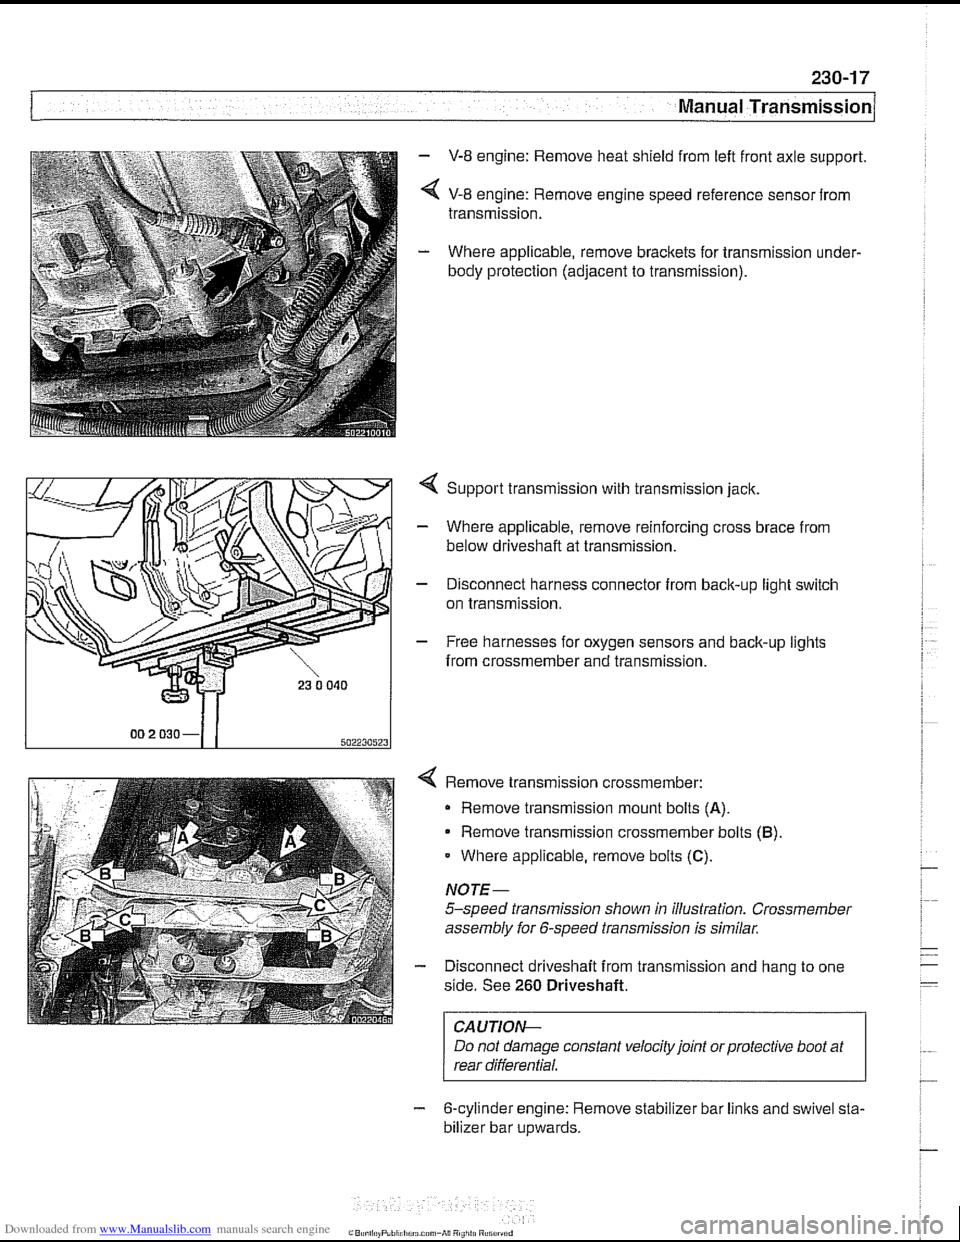 Bmw 530i 2001 E39 Workshop Manual Engine Module Wiring Diagram